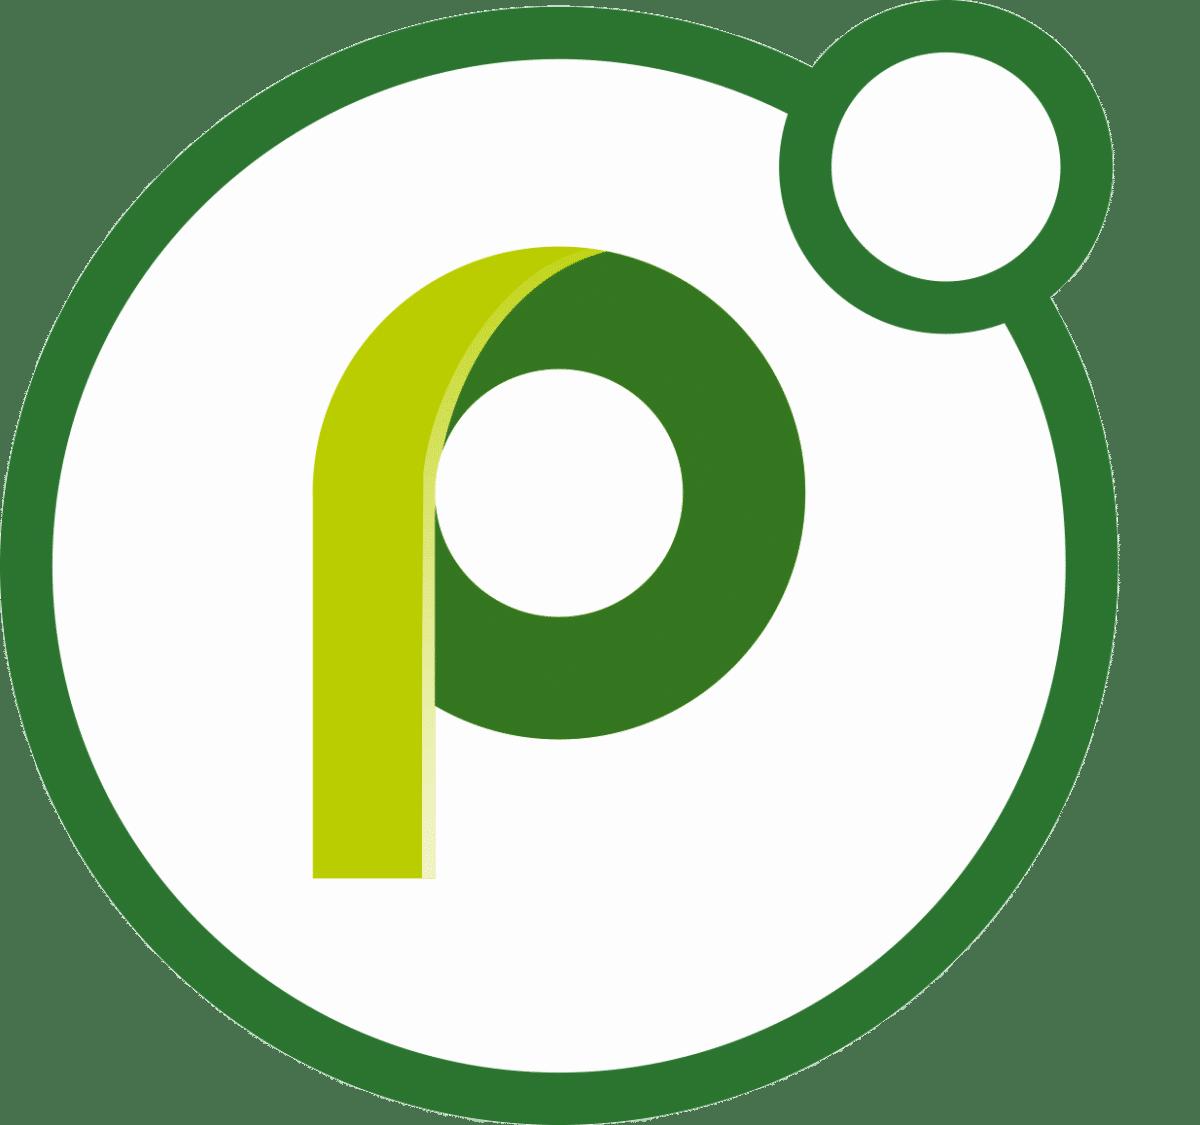 logo_powell365_